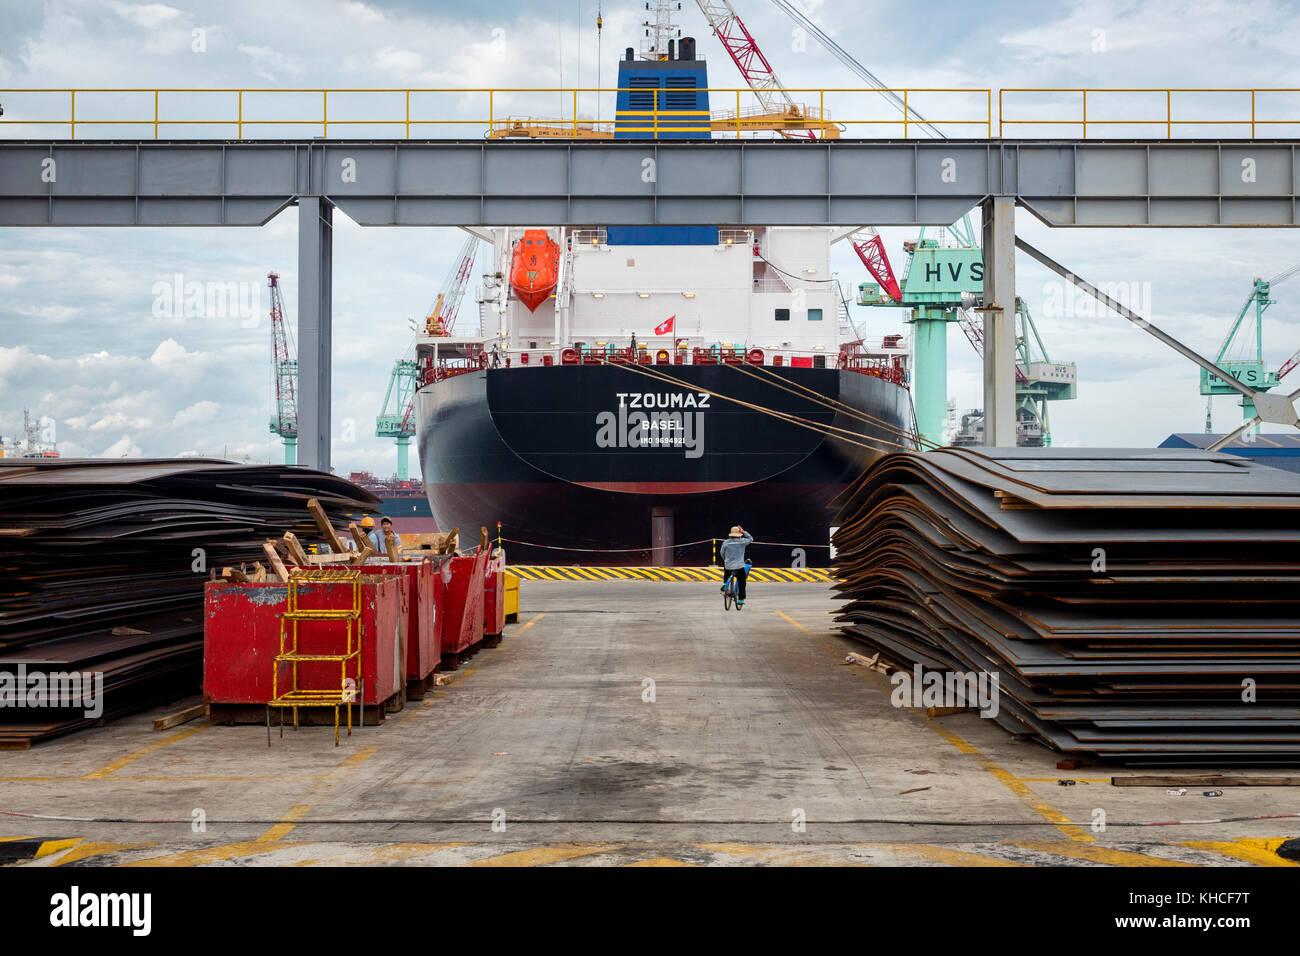 Shipbuilding steel plates in dockyard. Camranh shipyard. Vietnam Stock Photo